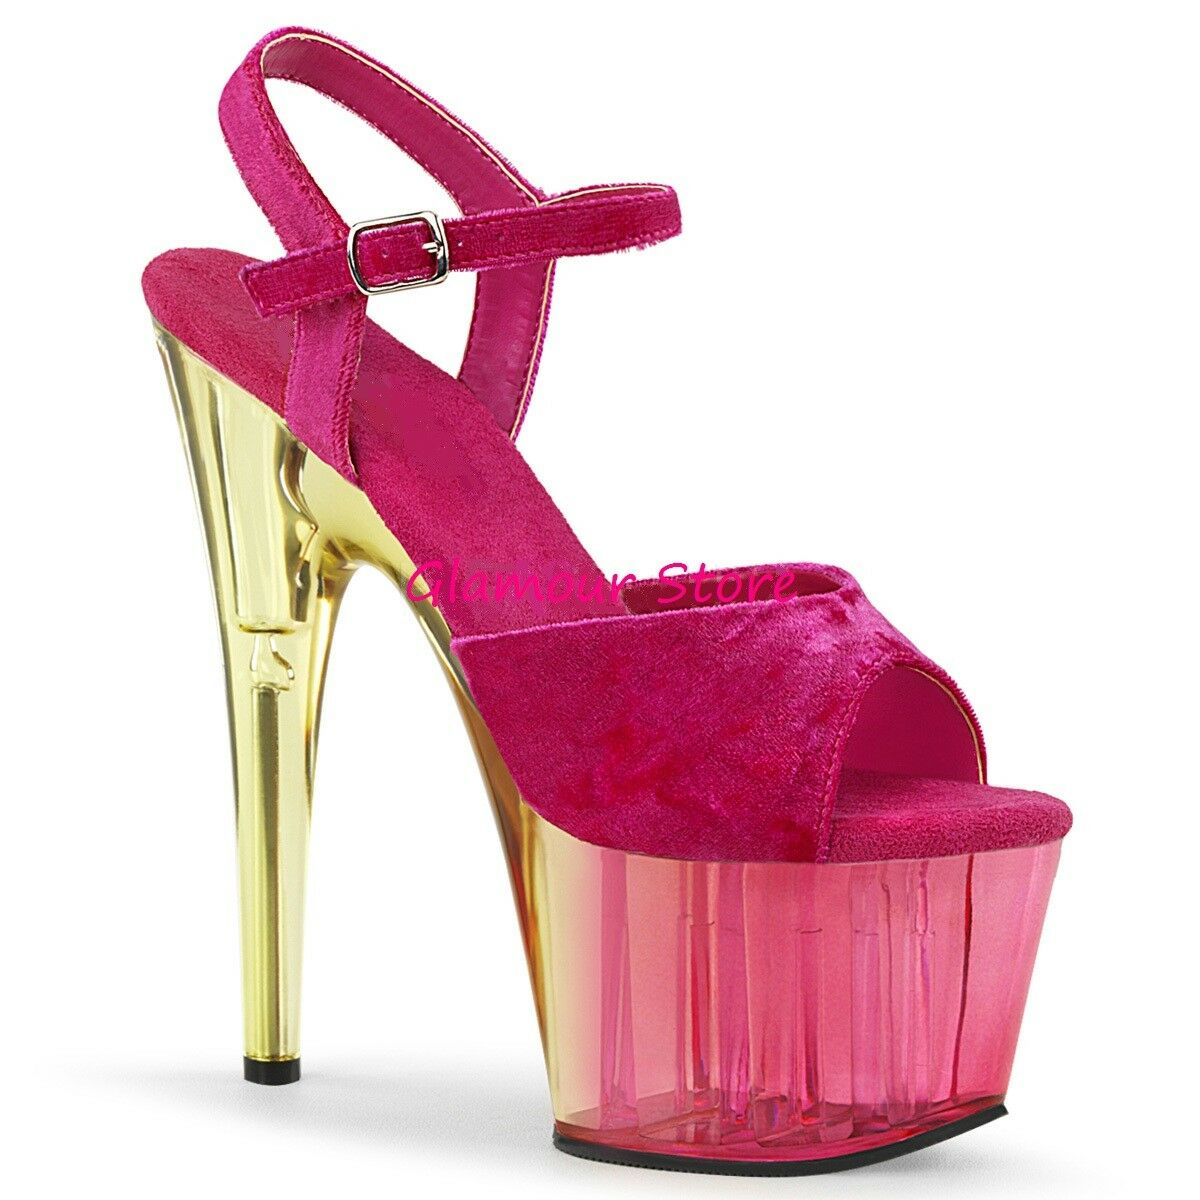 Unisa Scarpe Sandalo Donna SELMA 2018 PATENT RED Primavera Estate 2018 SELMA b83cda